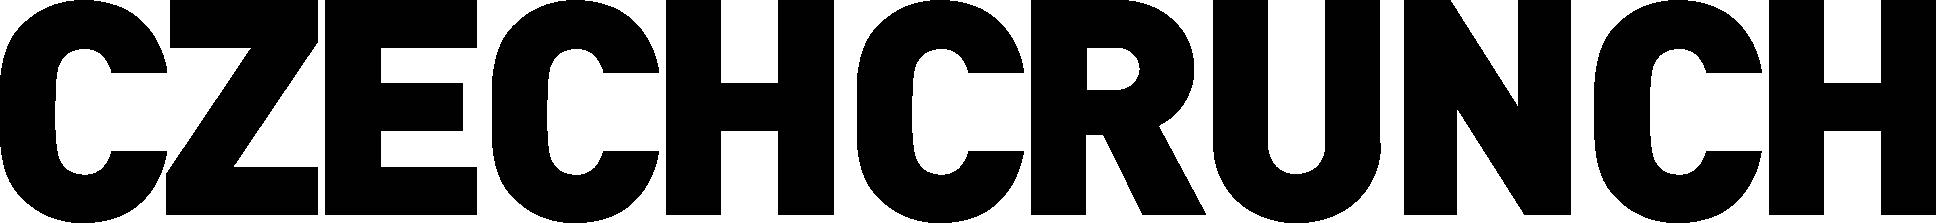 logo-czechcrubgbgbnch